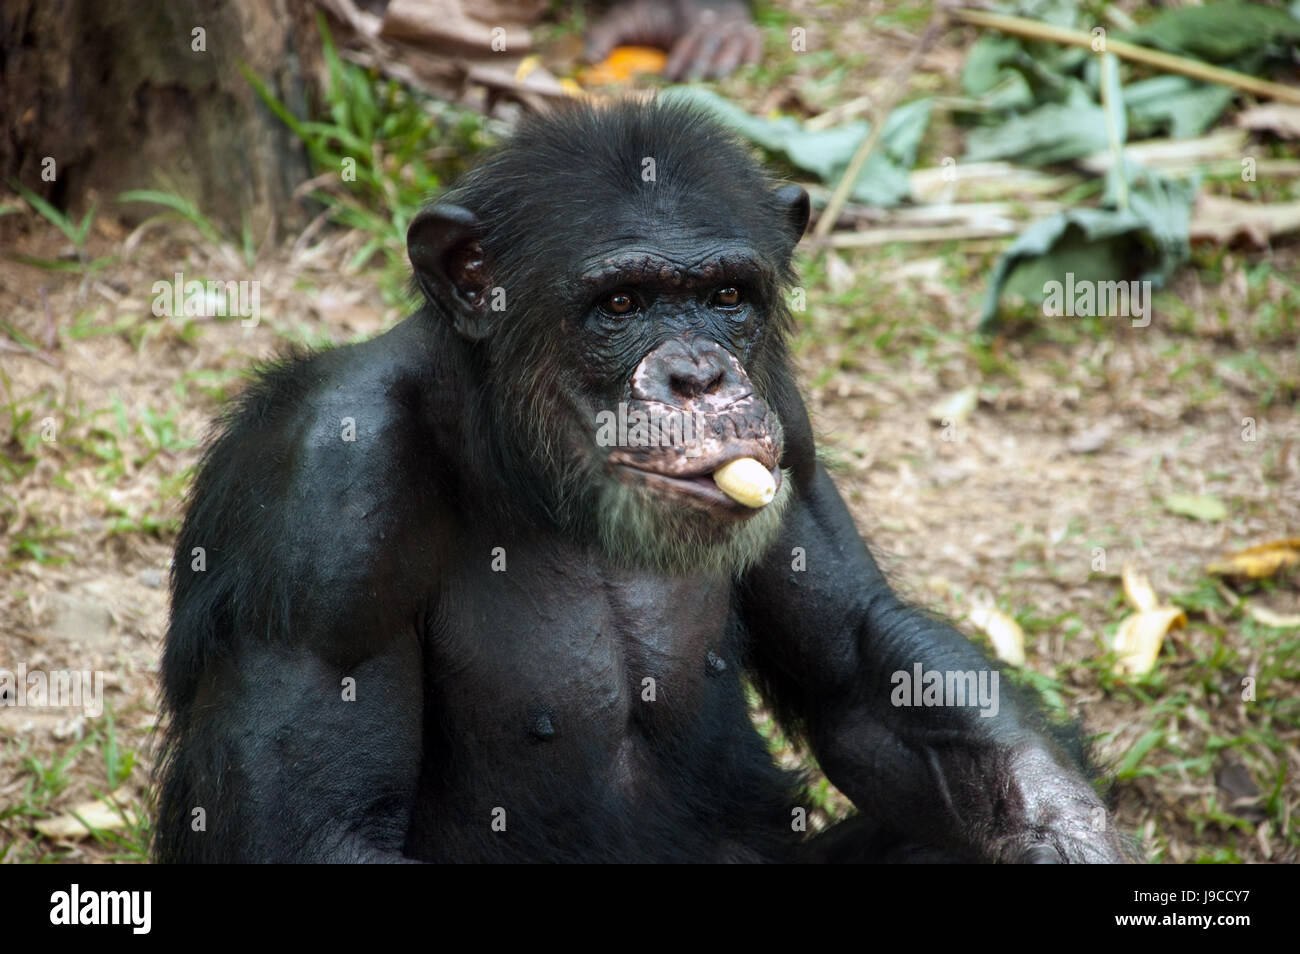 Portrait Of Chimpanzee Eating Banana In Zoo Malaysia Stock Photo